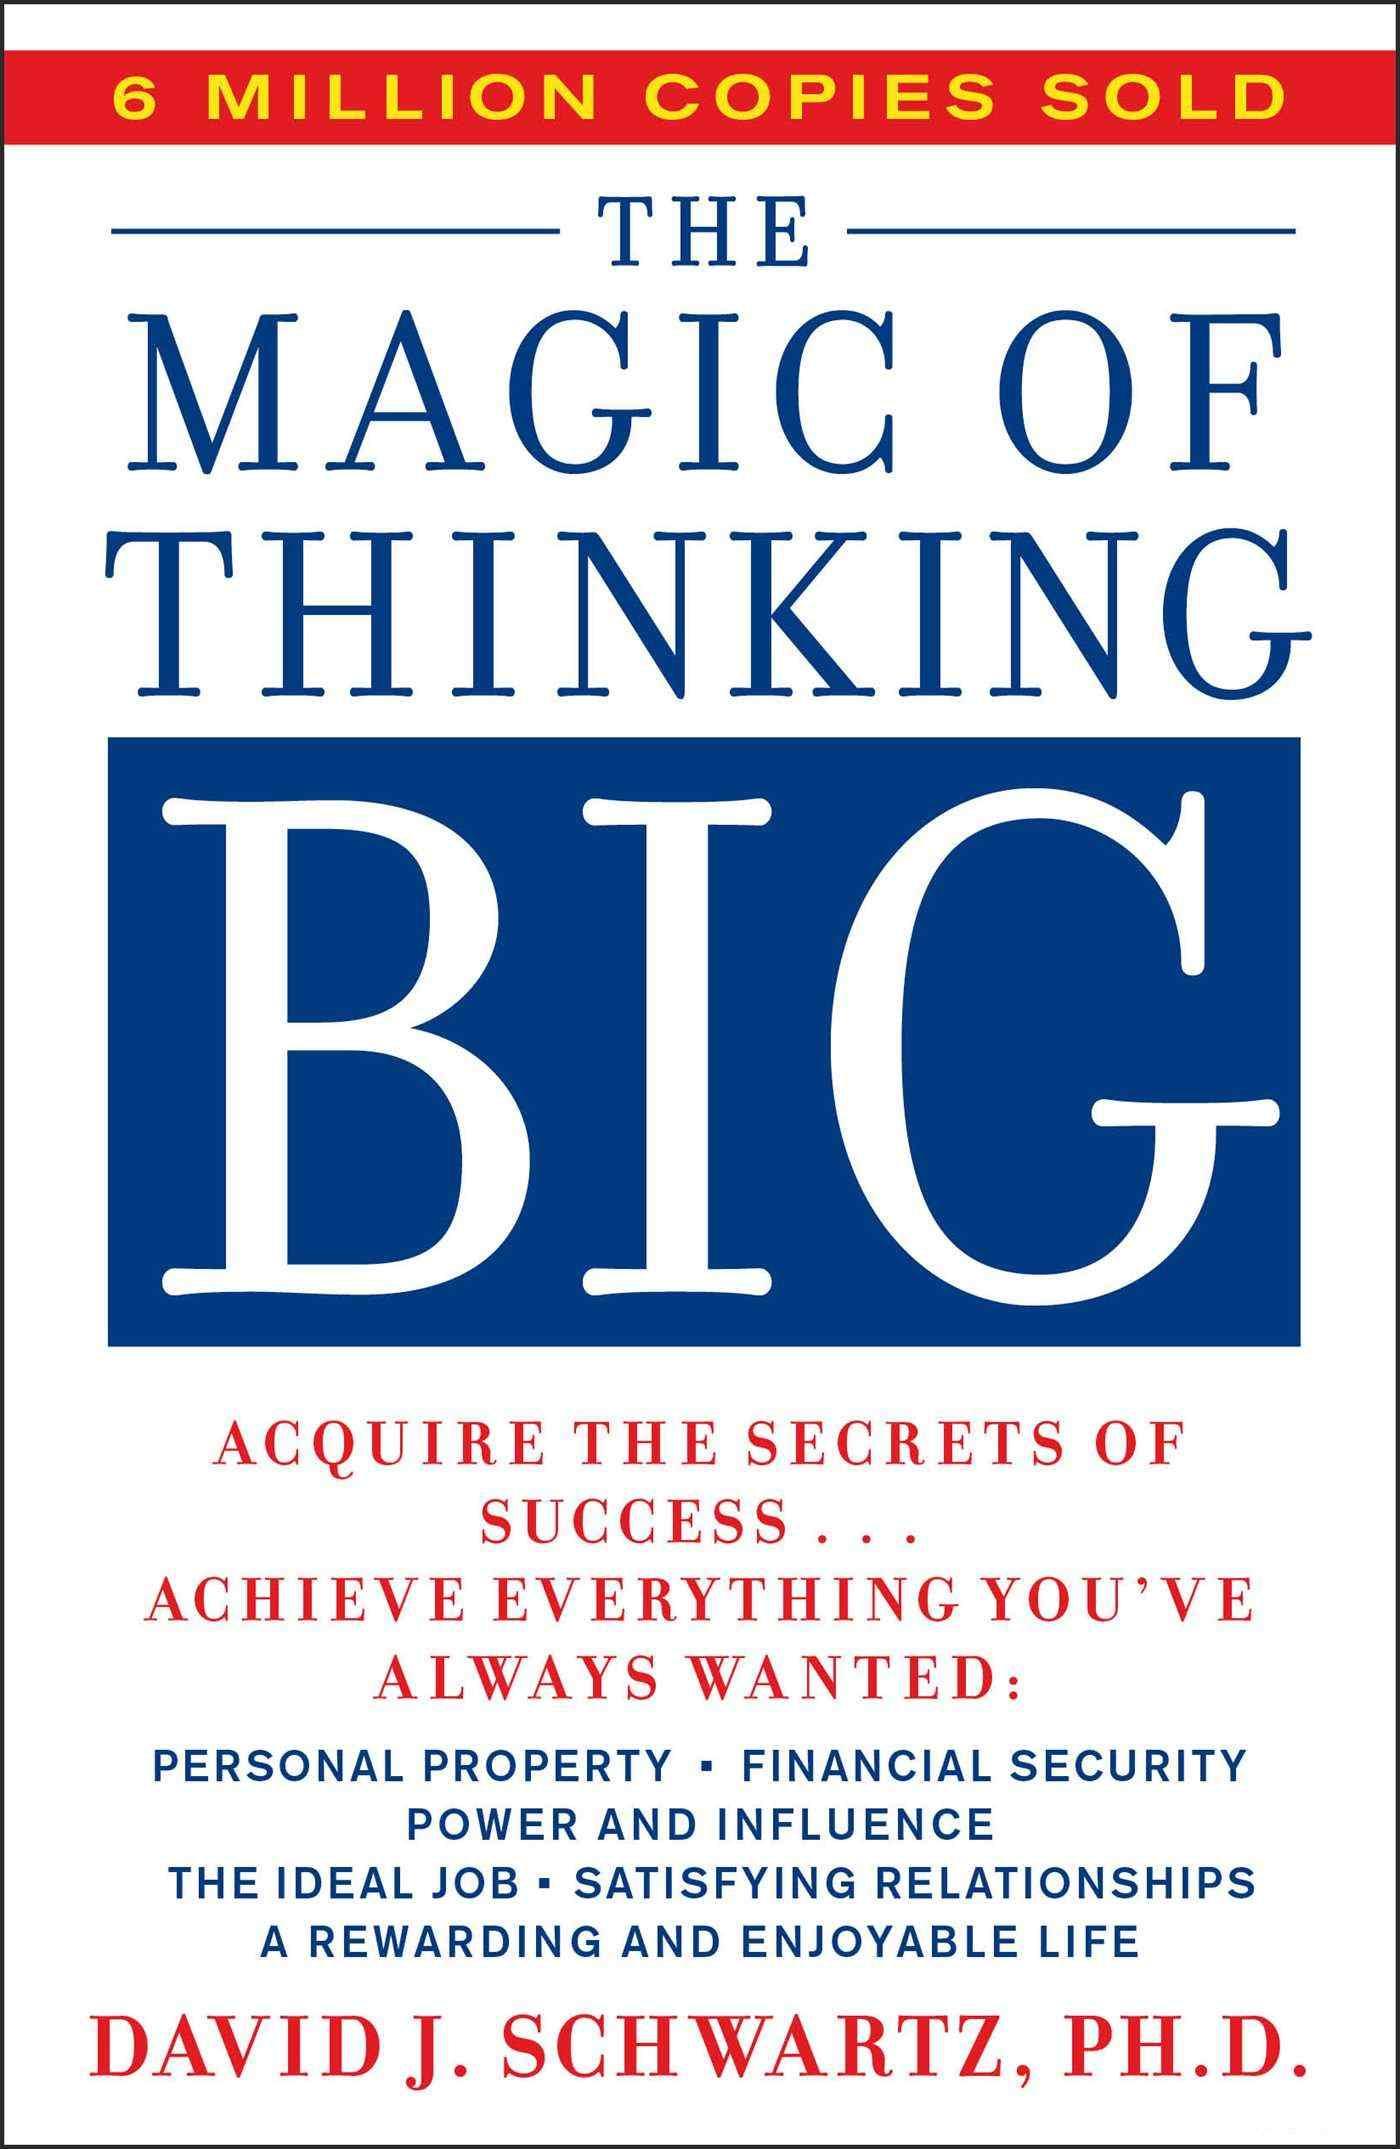 The magic of thinking big by David J.Schwartz